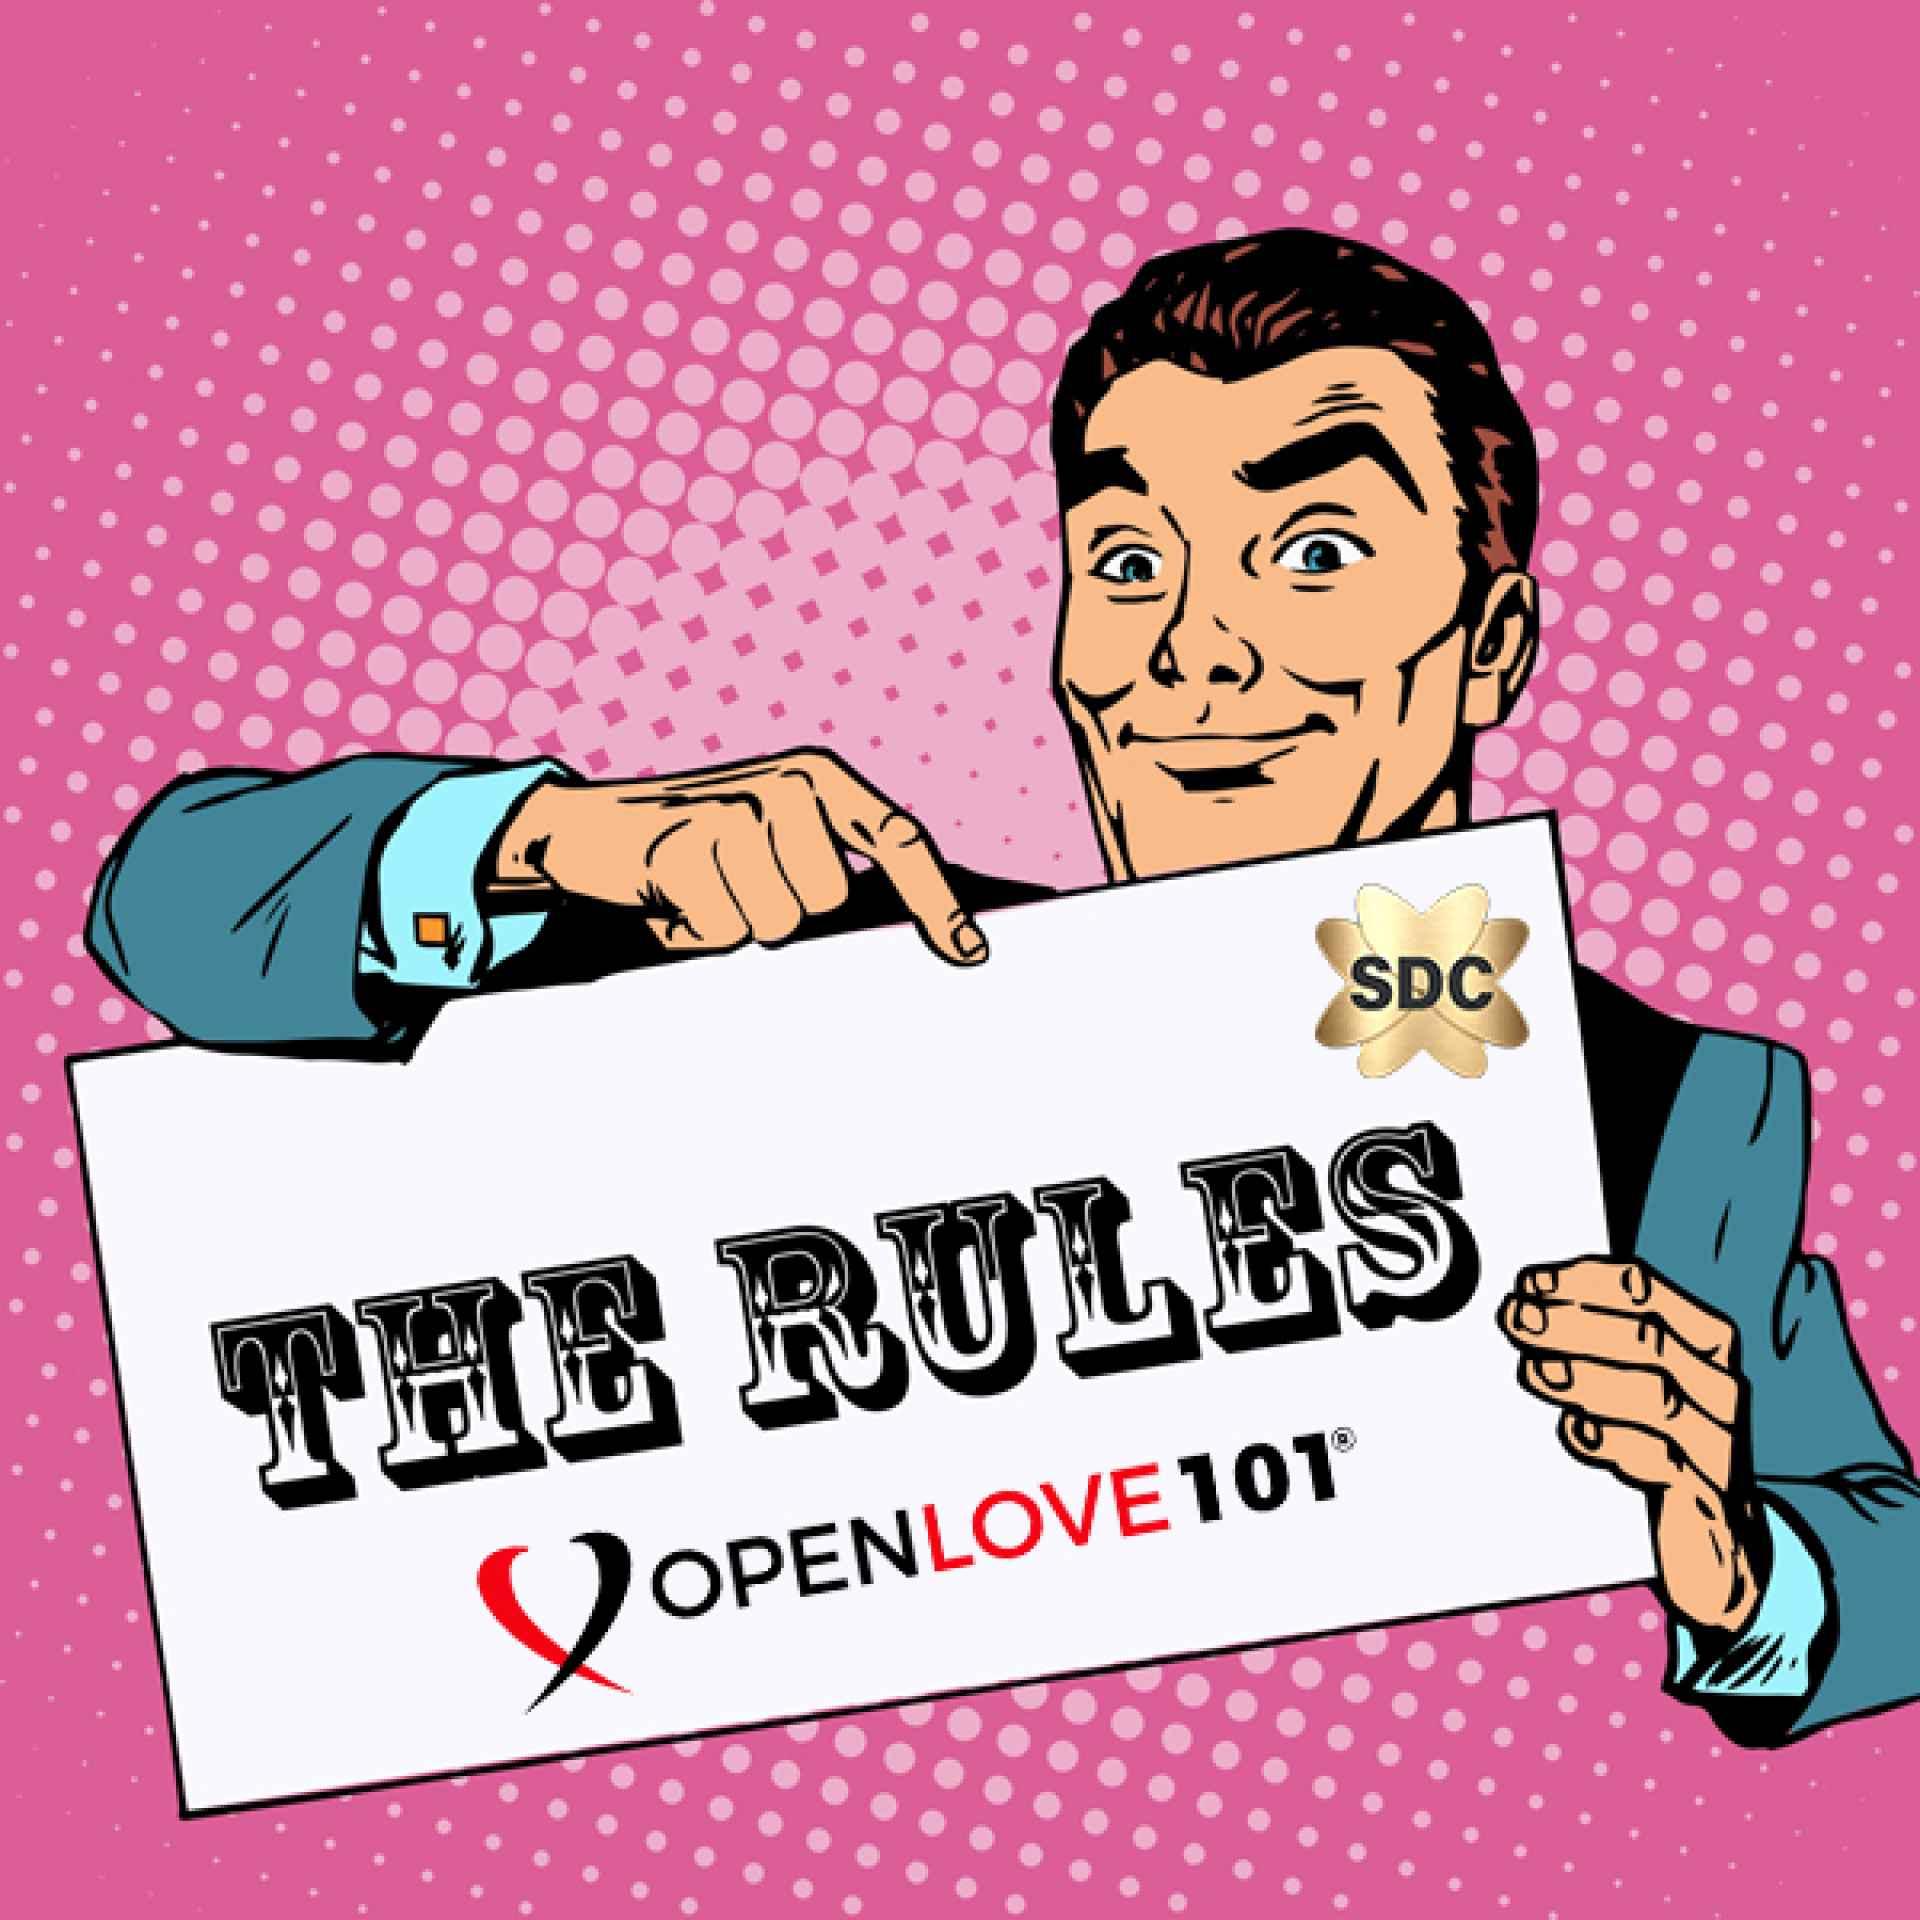 Règles du guide Openlove 101 SDC Newbie Lifestyle Club